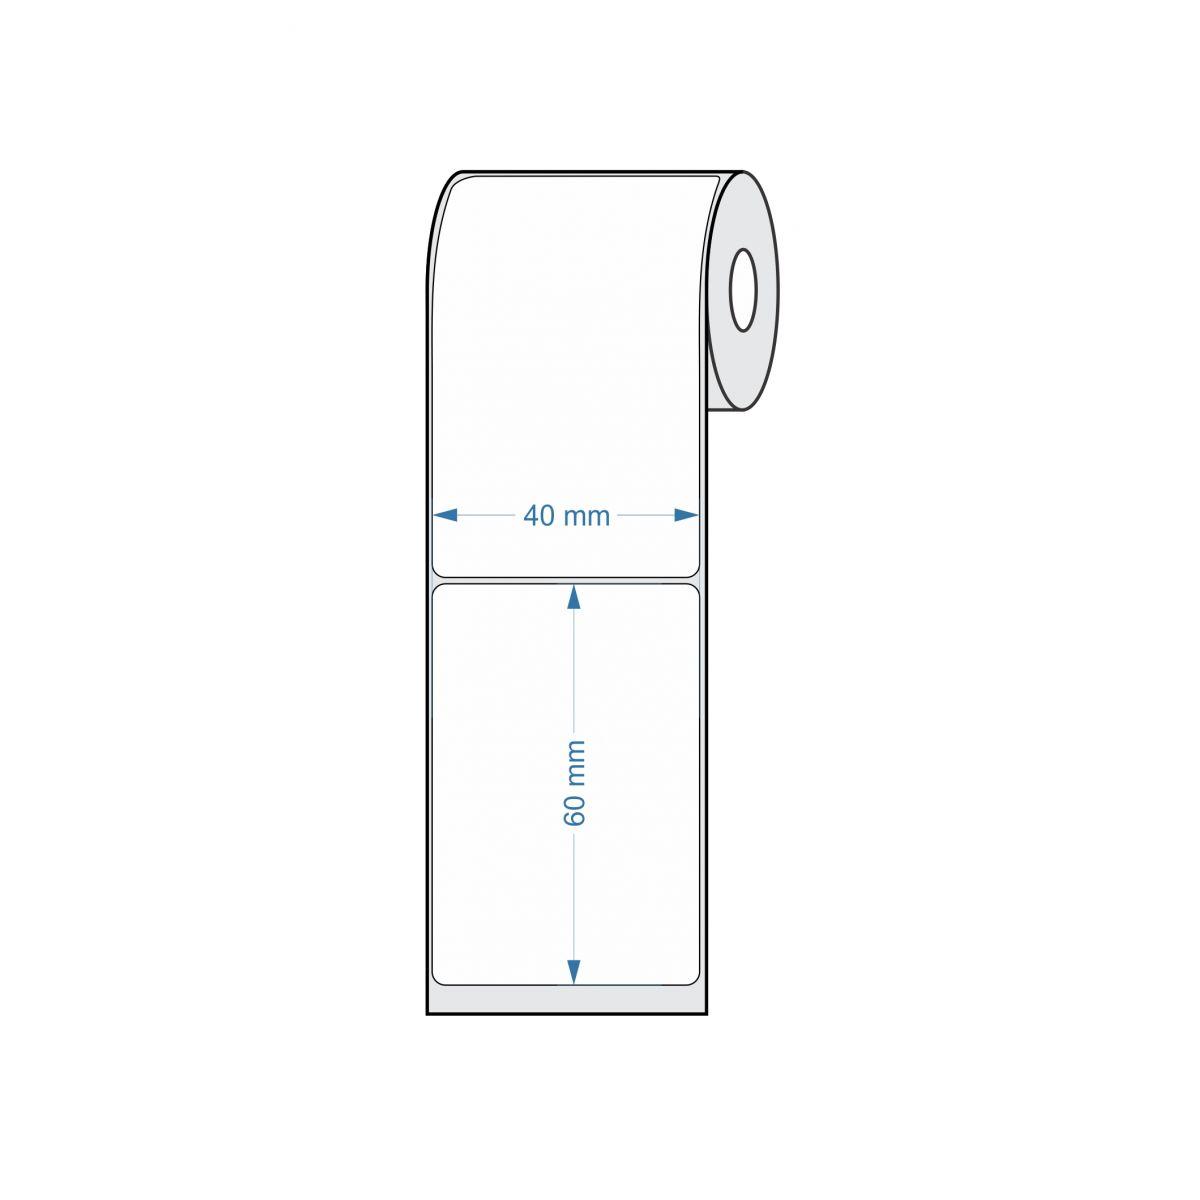 Etiquetas Adesivas para Balança 40x60 25 metros